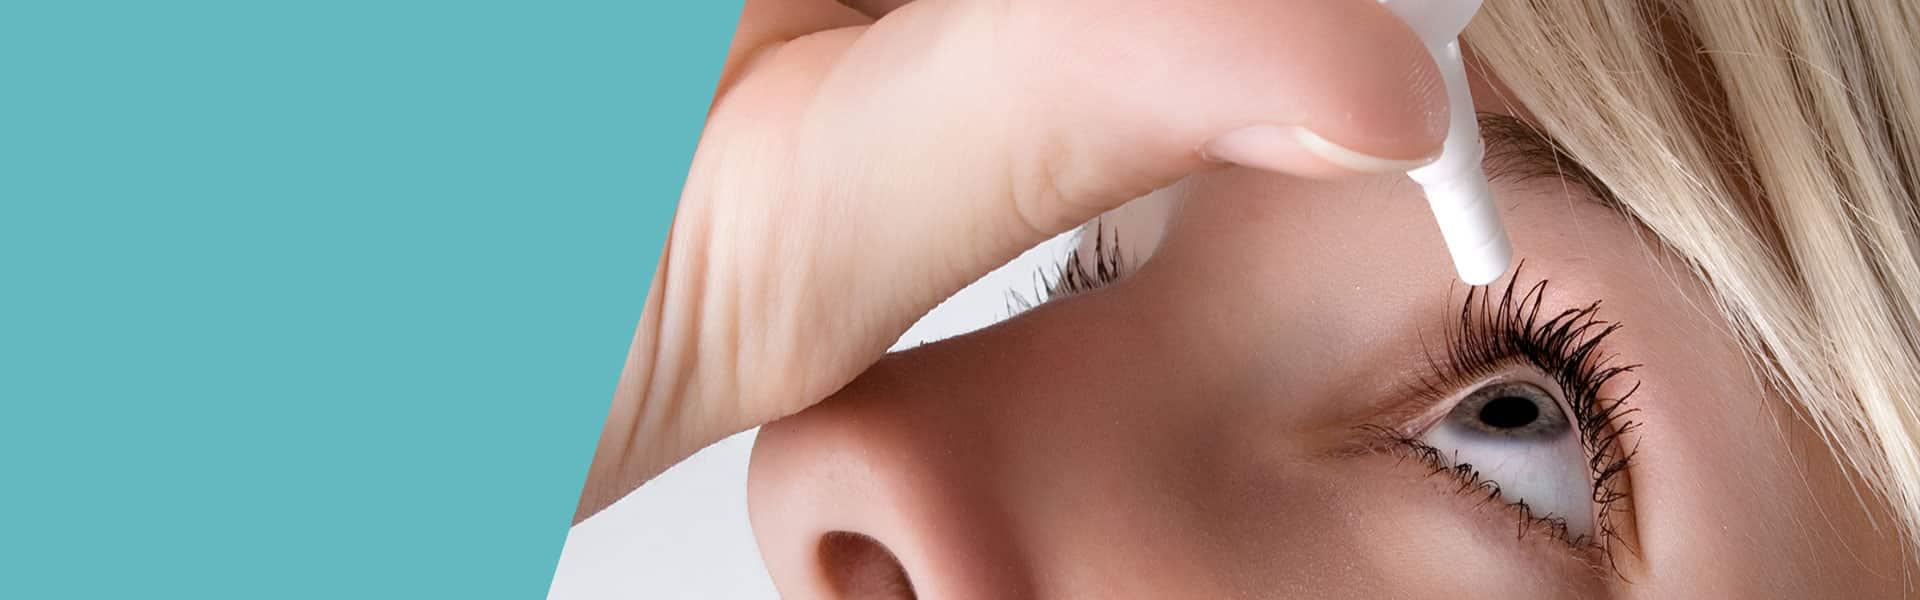 Torra ögon - E-Eye